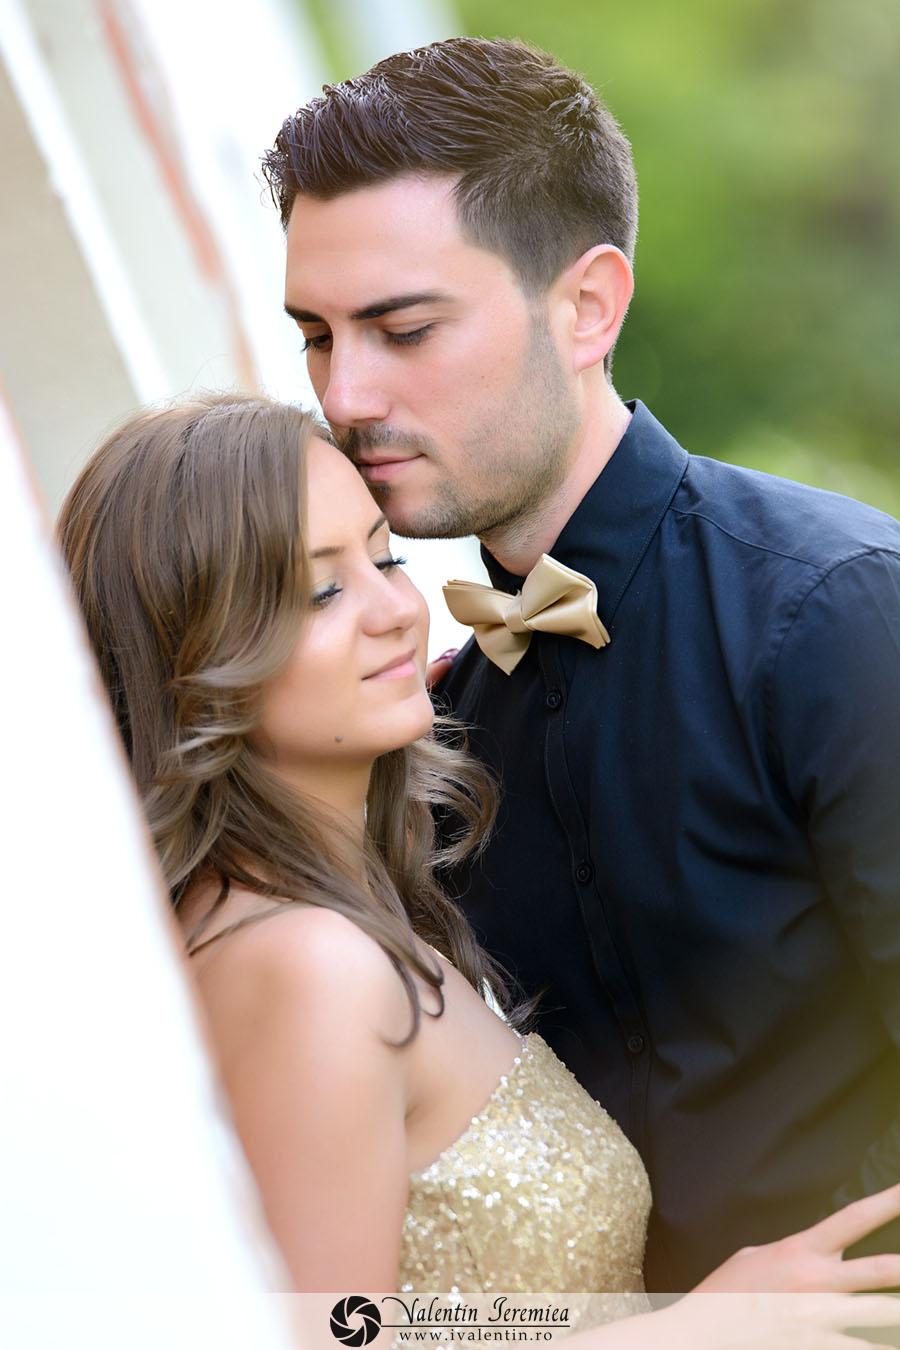 fotograf-nunta-craiova-ziua-nunta-recomandati-locatie-petrecere-cununie-civila-sedinta-foto-fotograf-craiova-valentin-ieremiea (4)